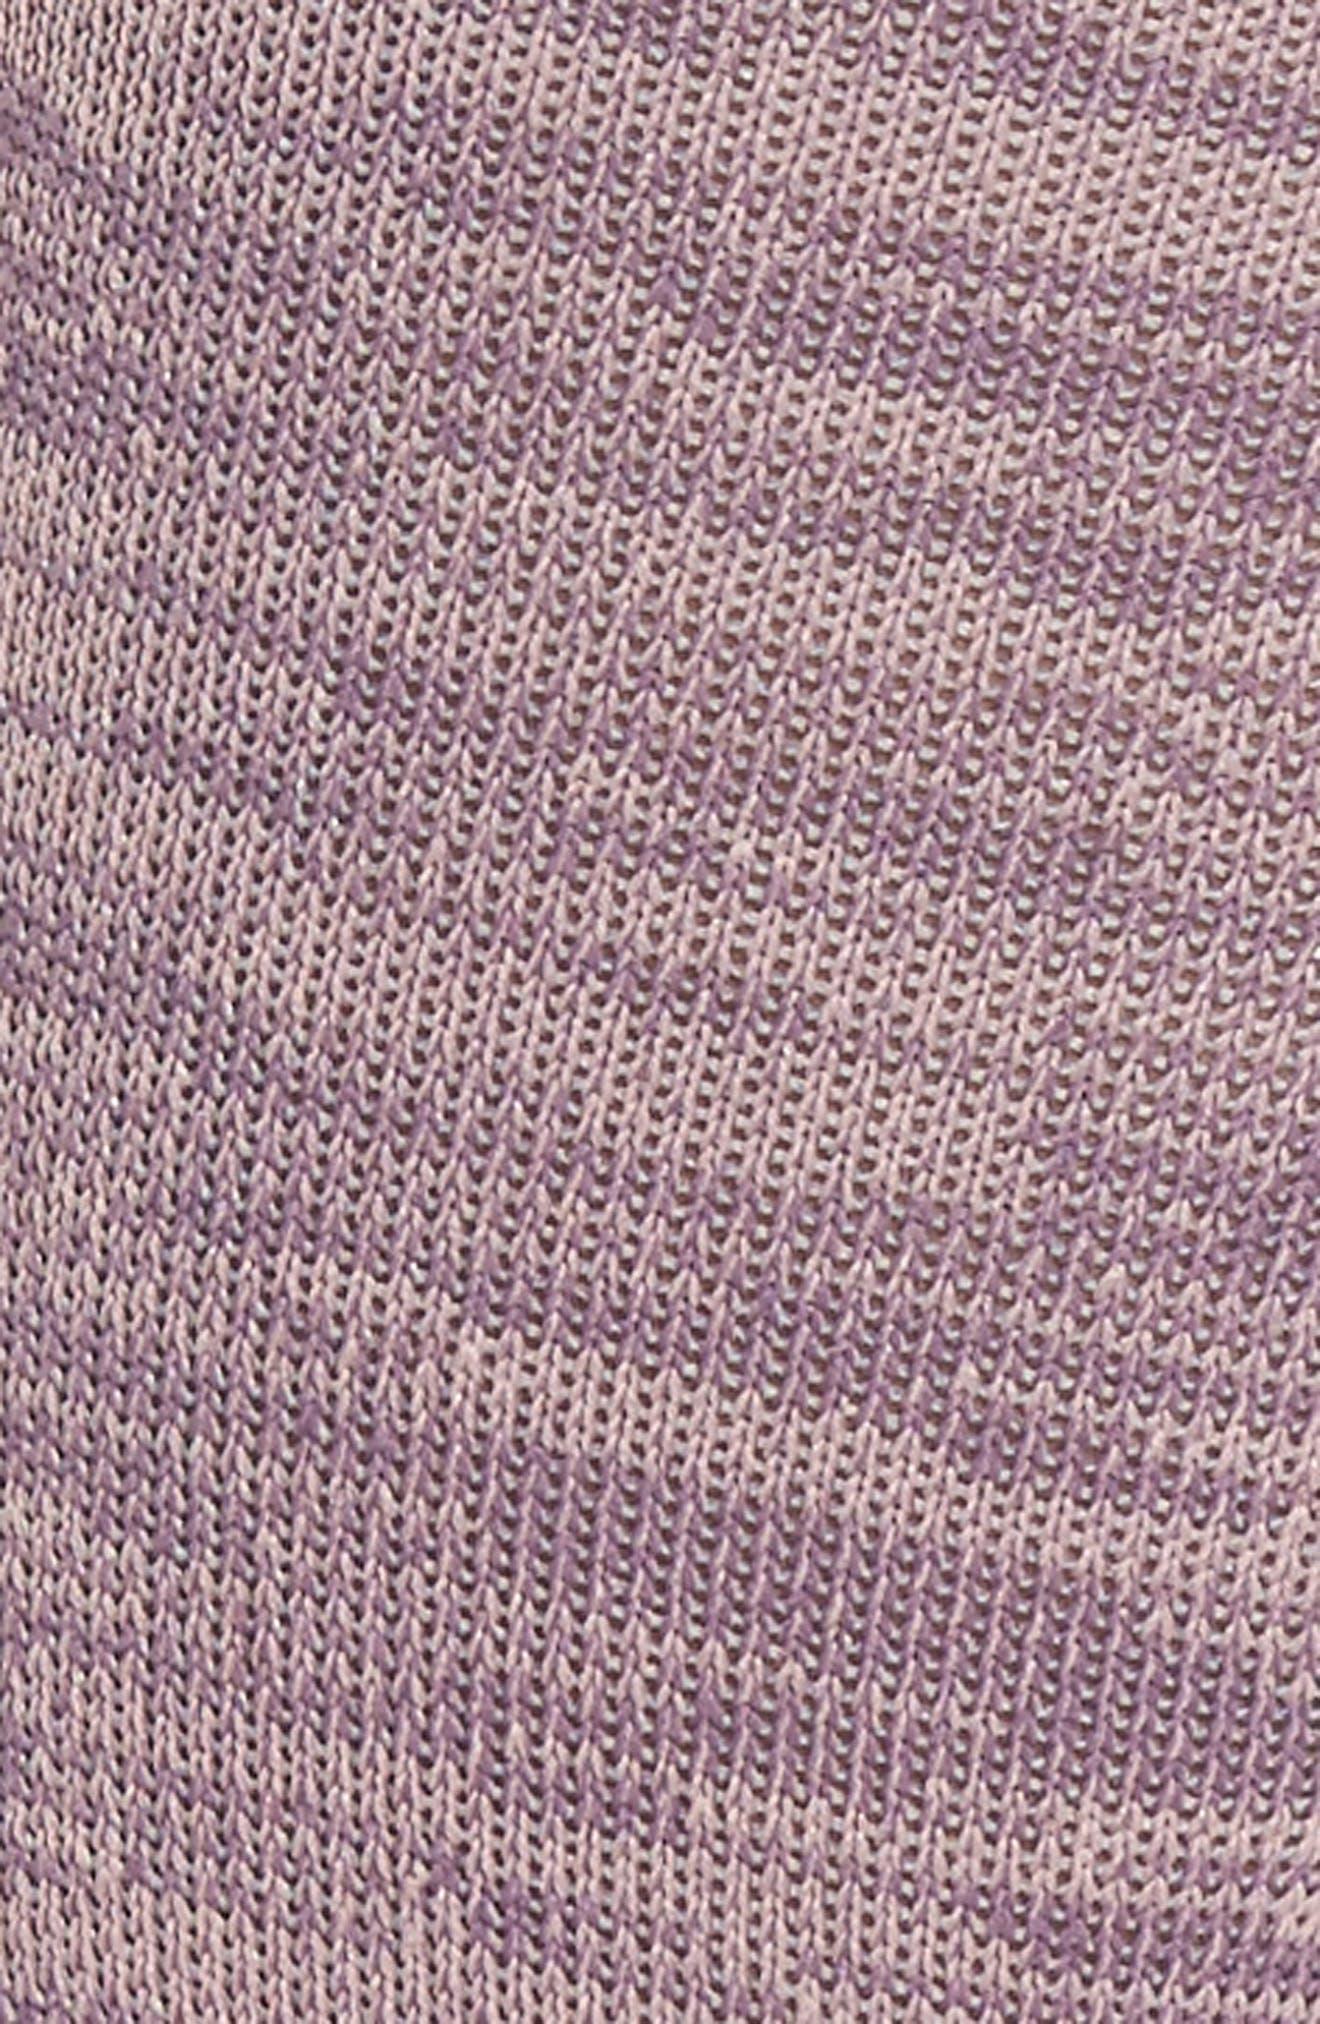 Slay Girl Athletic Crew Socks,                             Alternate thumbnail 3, color,                             Purple